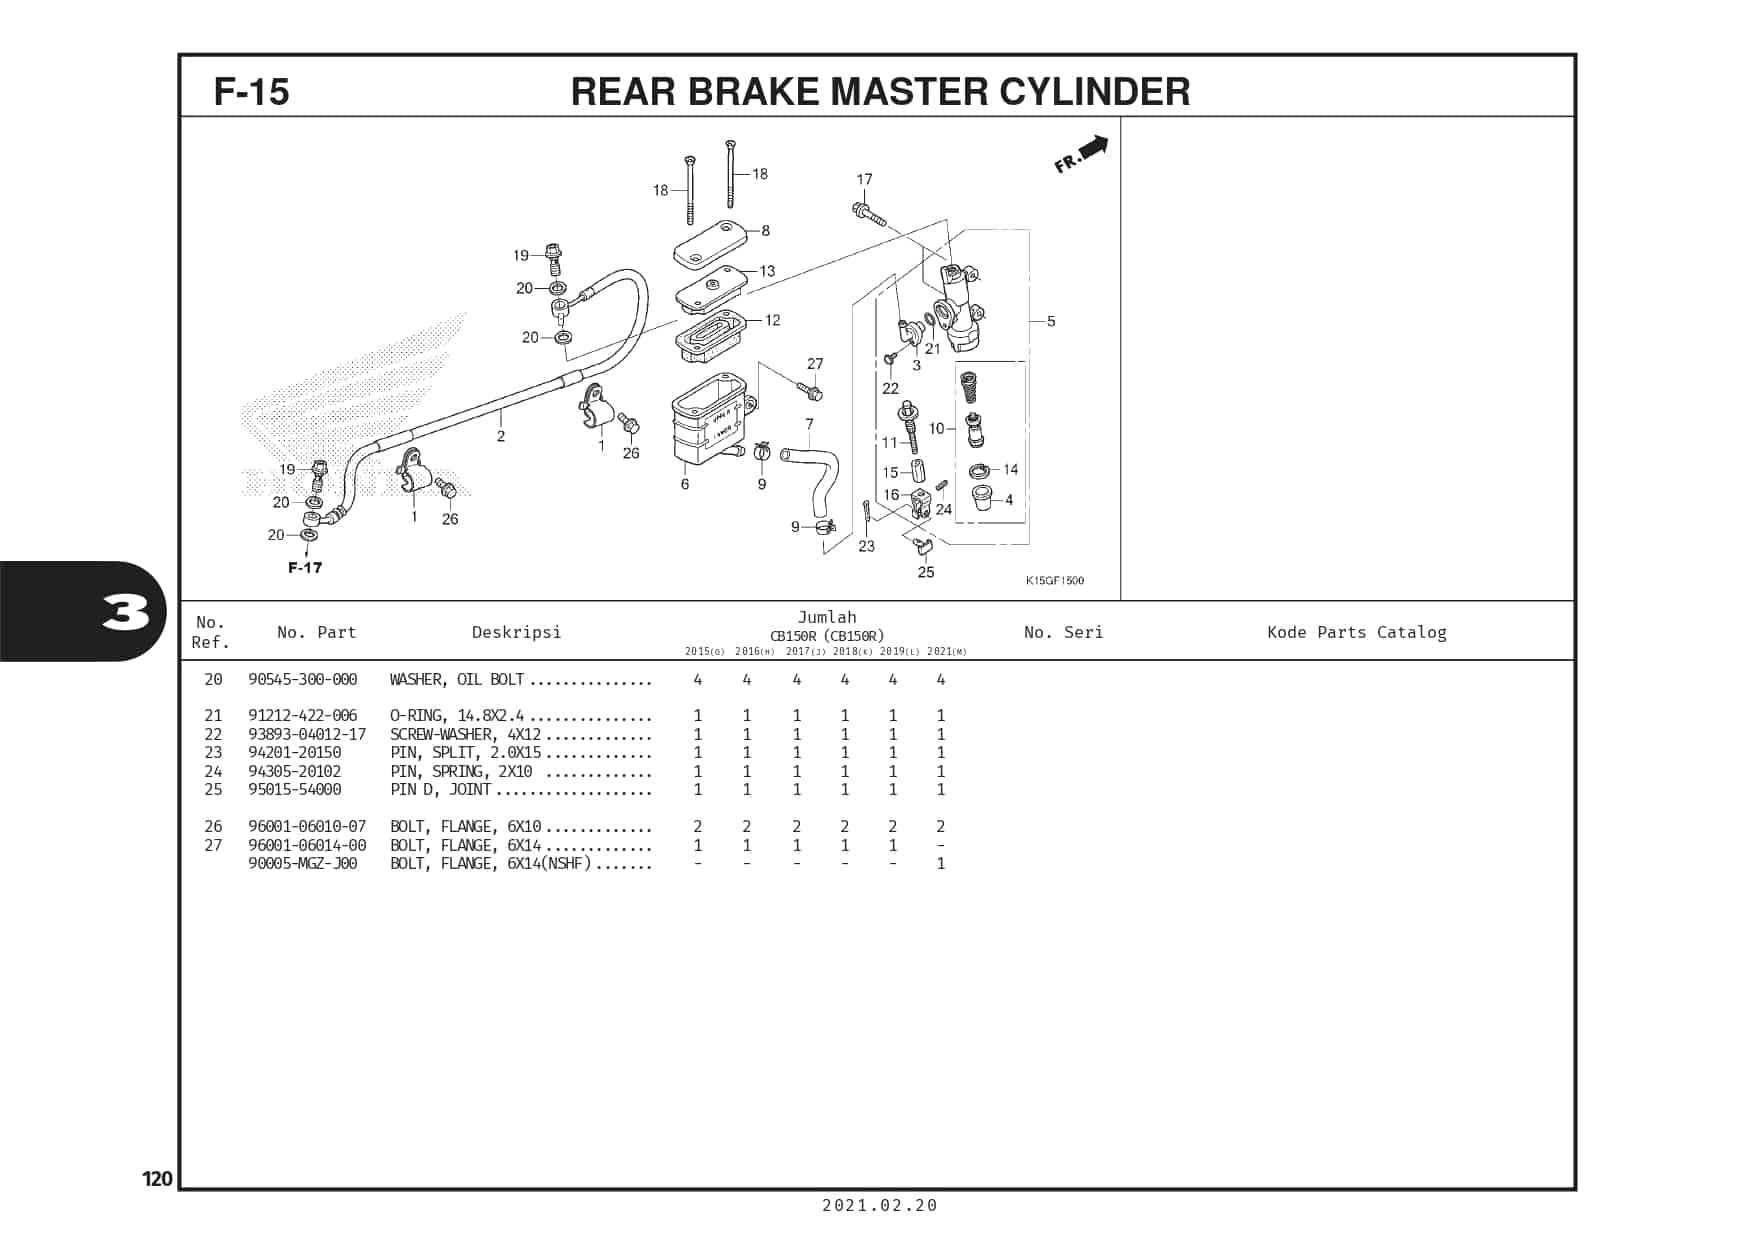 F-15 Rear Brake Master Cylinder